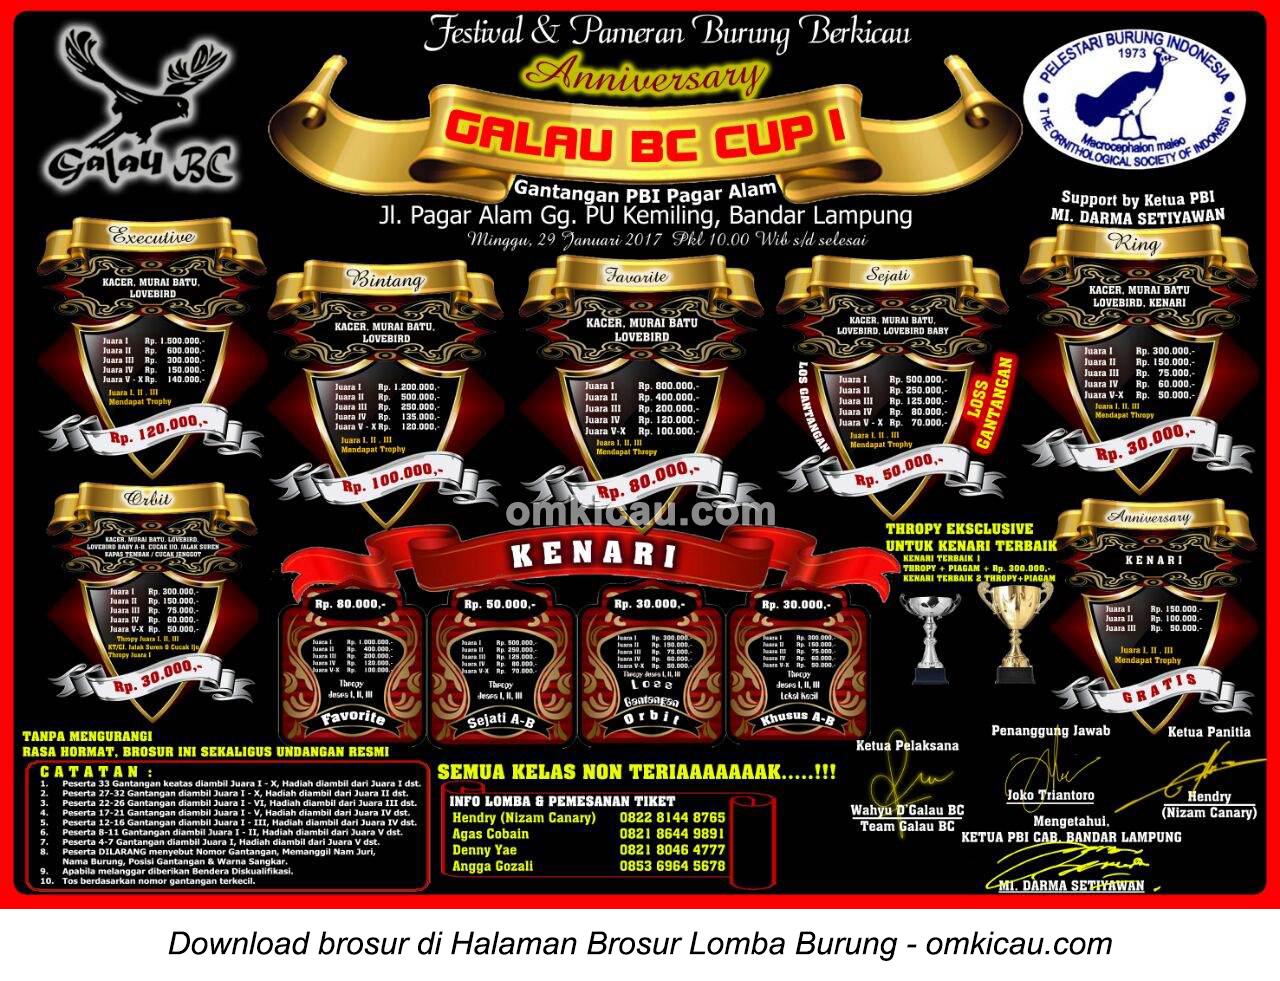 Brosur Lomba Burung Berkicau Anniversary Galau BC Cup I, Bandarlampung, 29 Januari 2017